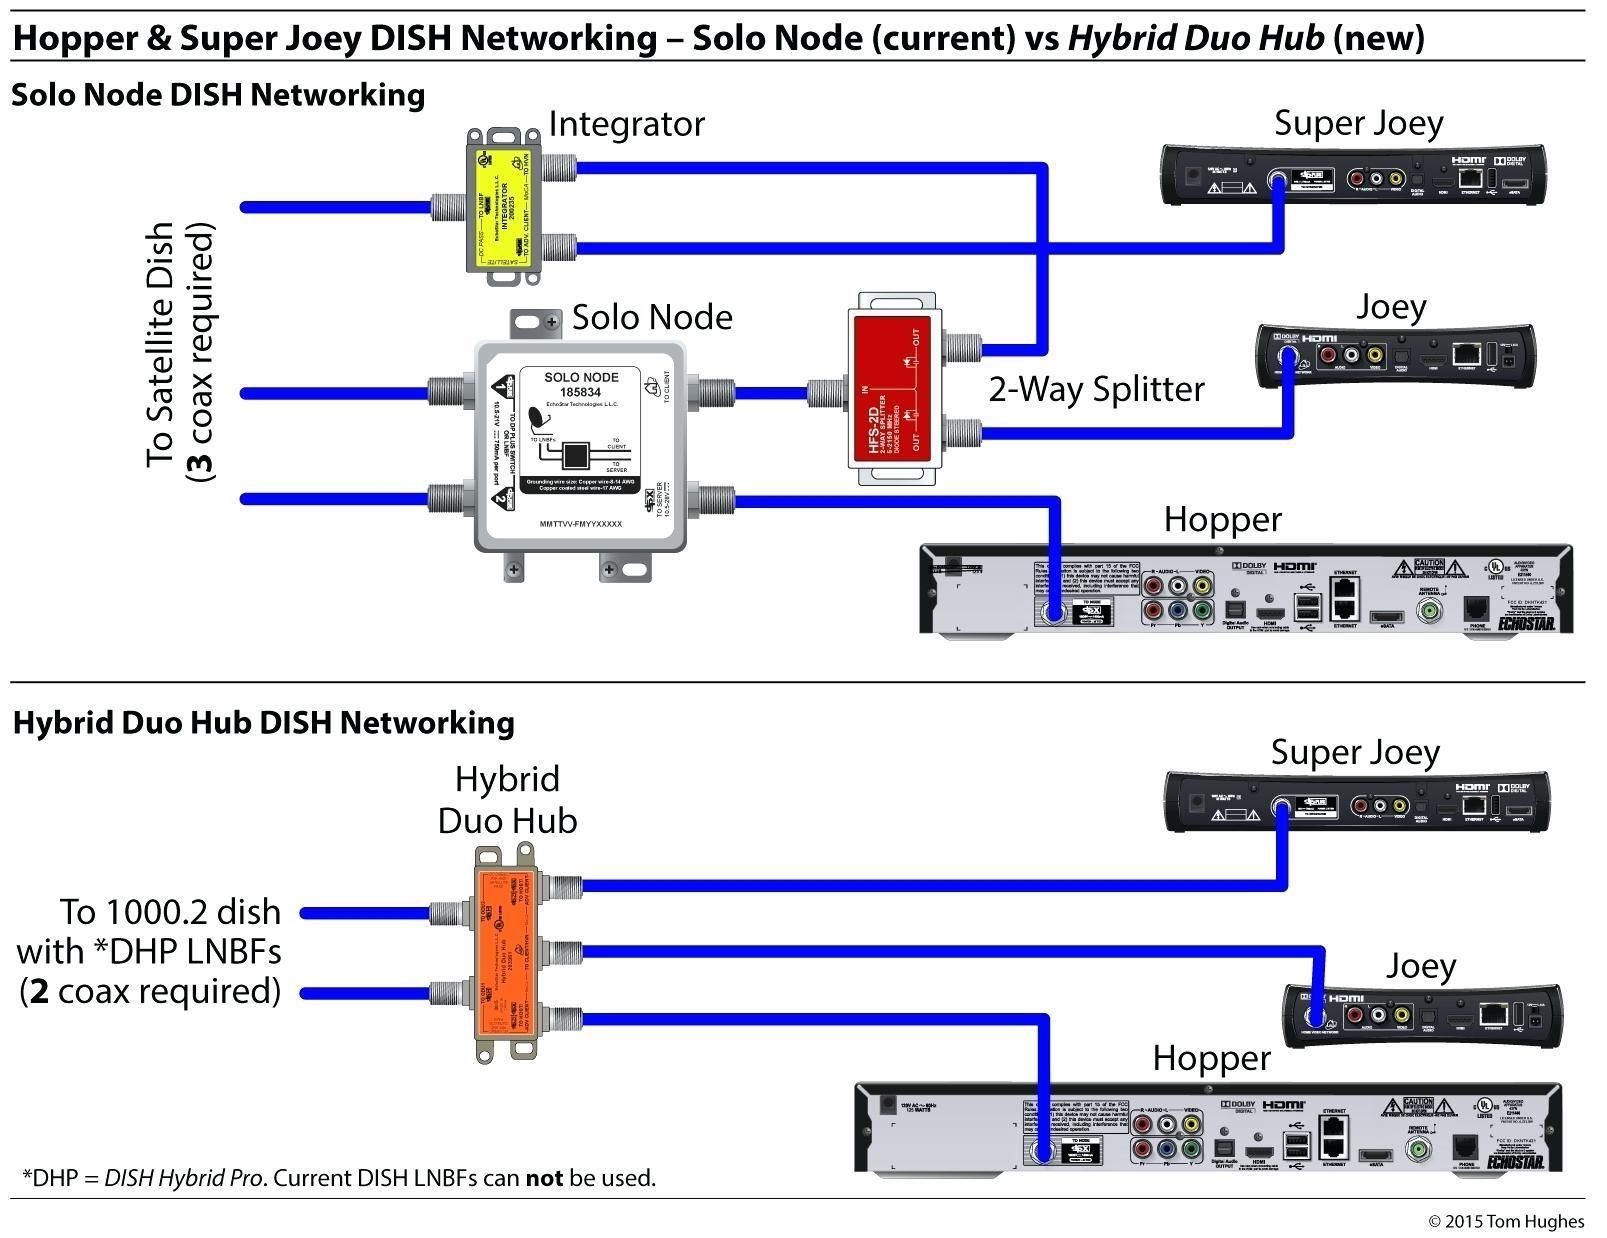 Directv Swm Splitter Wiring Diagram Dish Wiring Diagram Inspiration Diagram Networking Collections Of Directv Swm Splitter Wiring Diagram